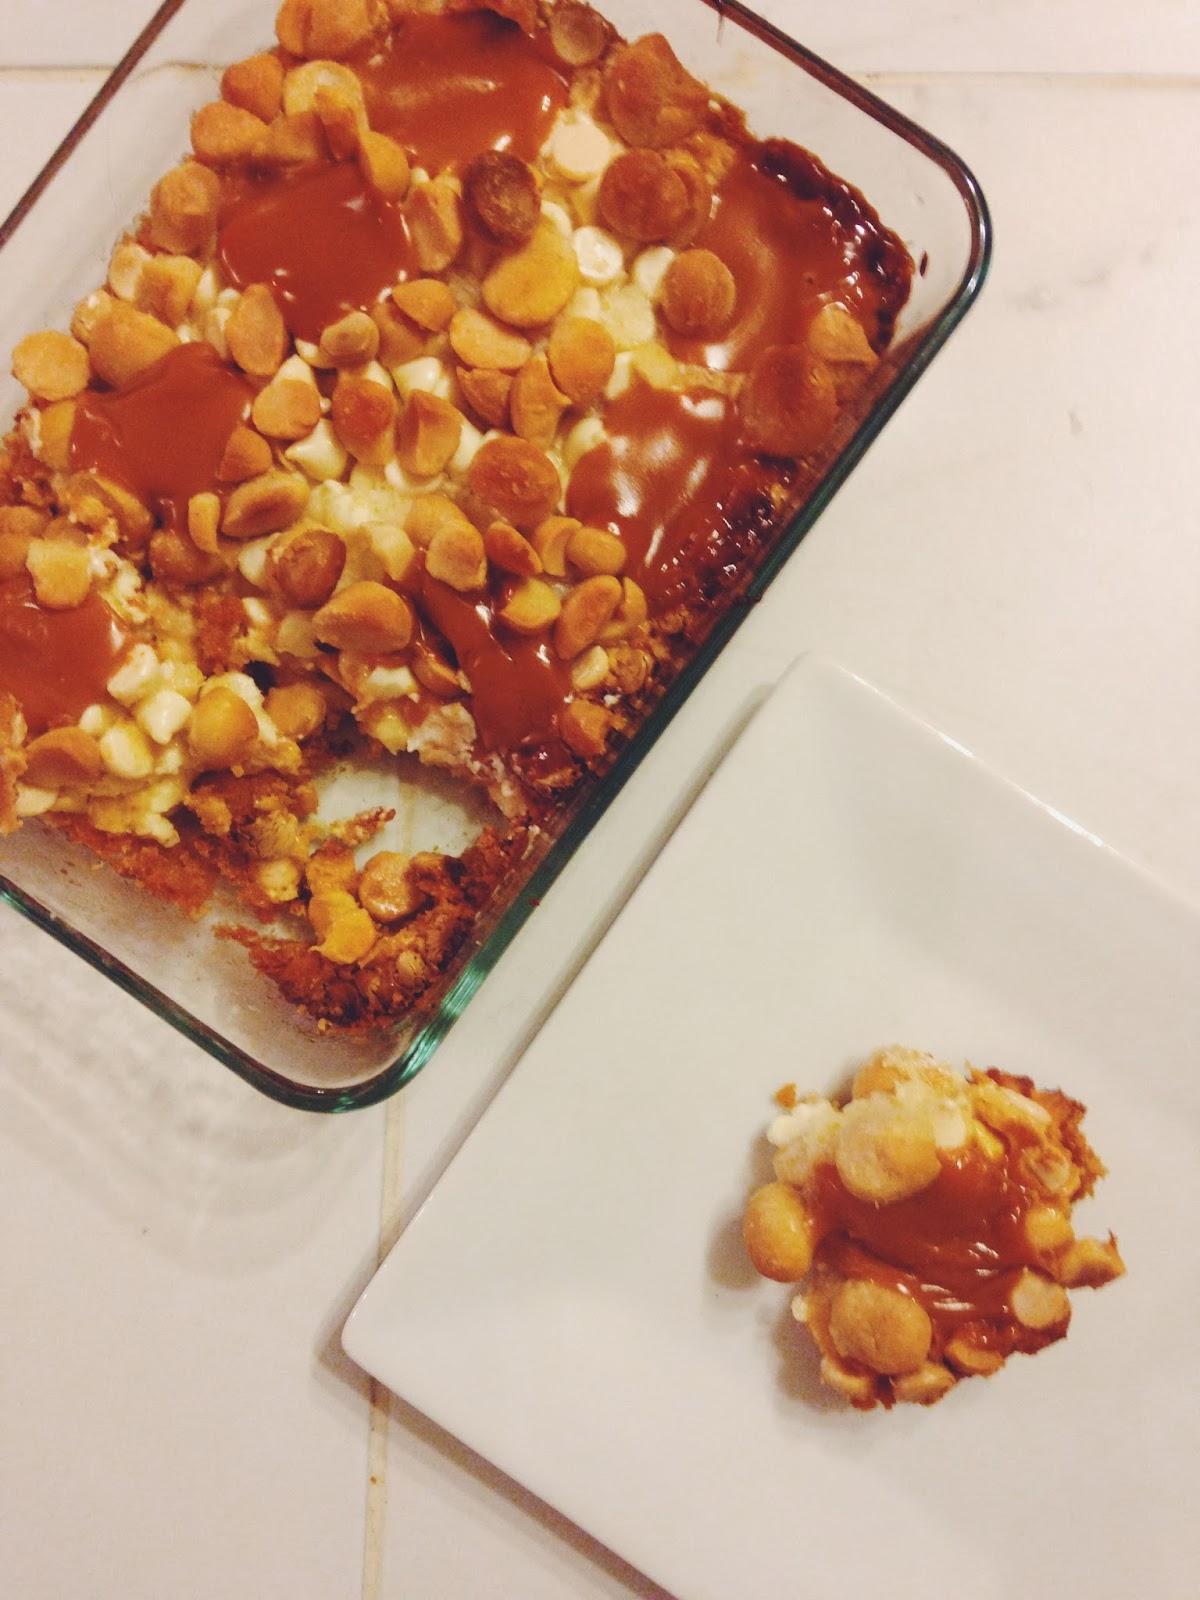 ... Sparkle Kitchen: White Chocolate, Macadamia Nut & Caramel Cookie Bars